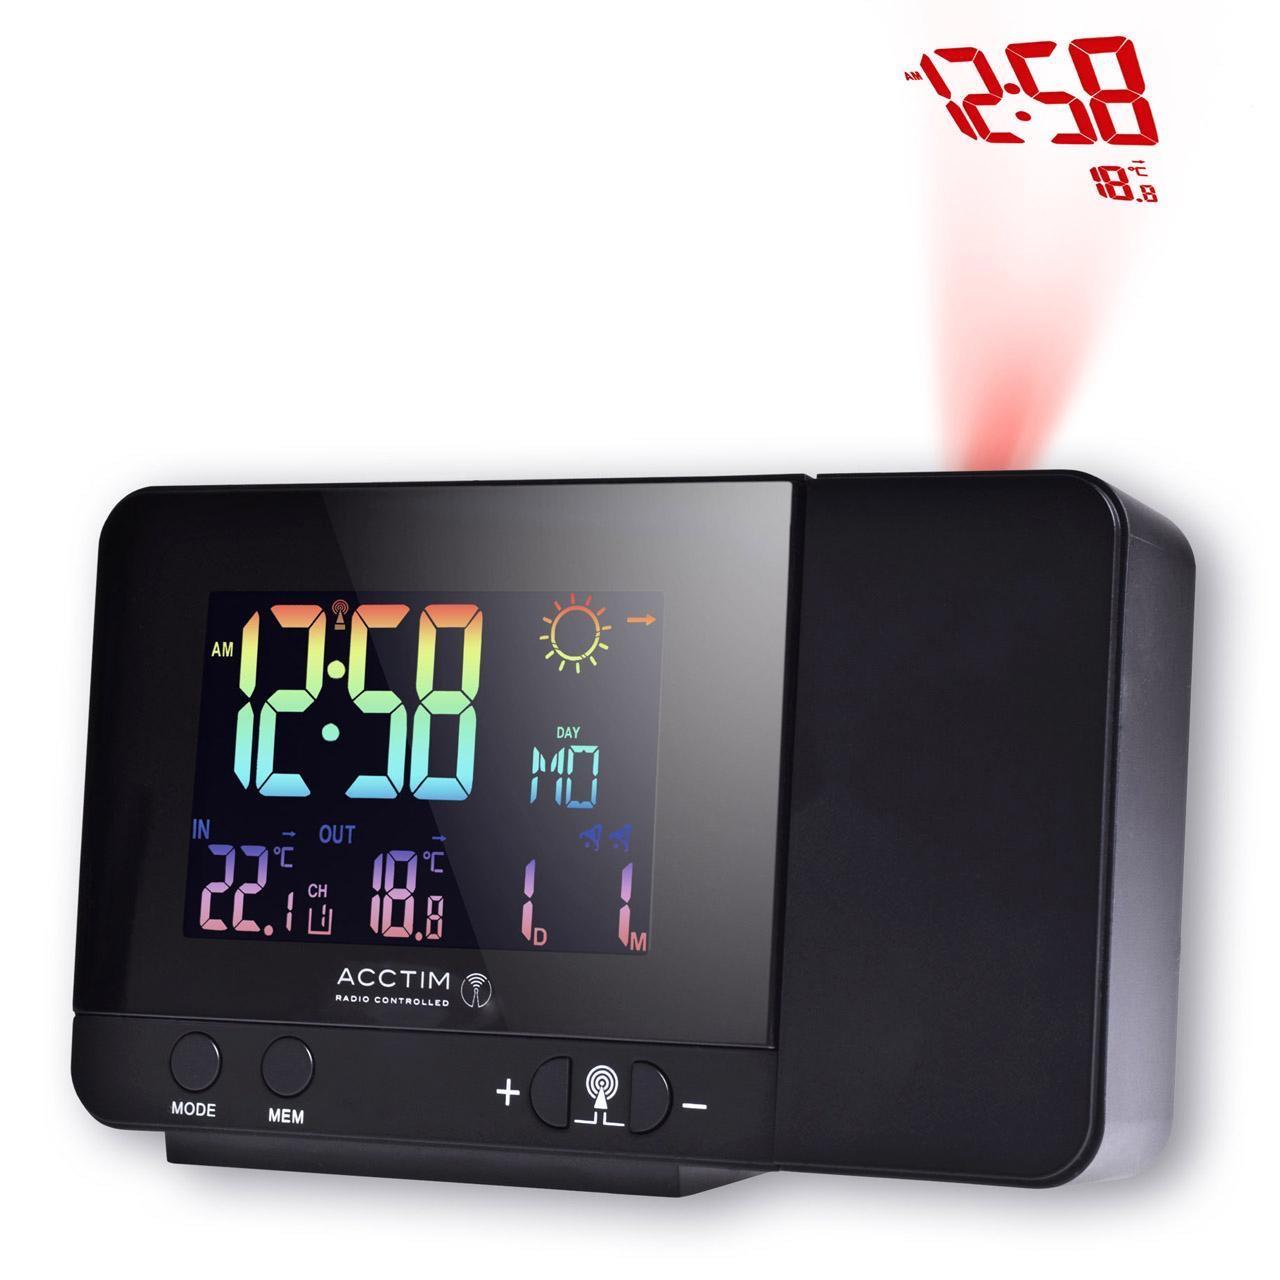 Acctim Weather Station Alarm Clock, Half Price only Ocado - £32.50